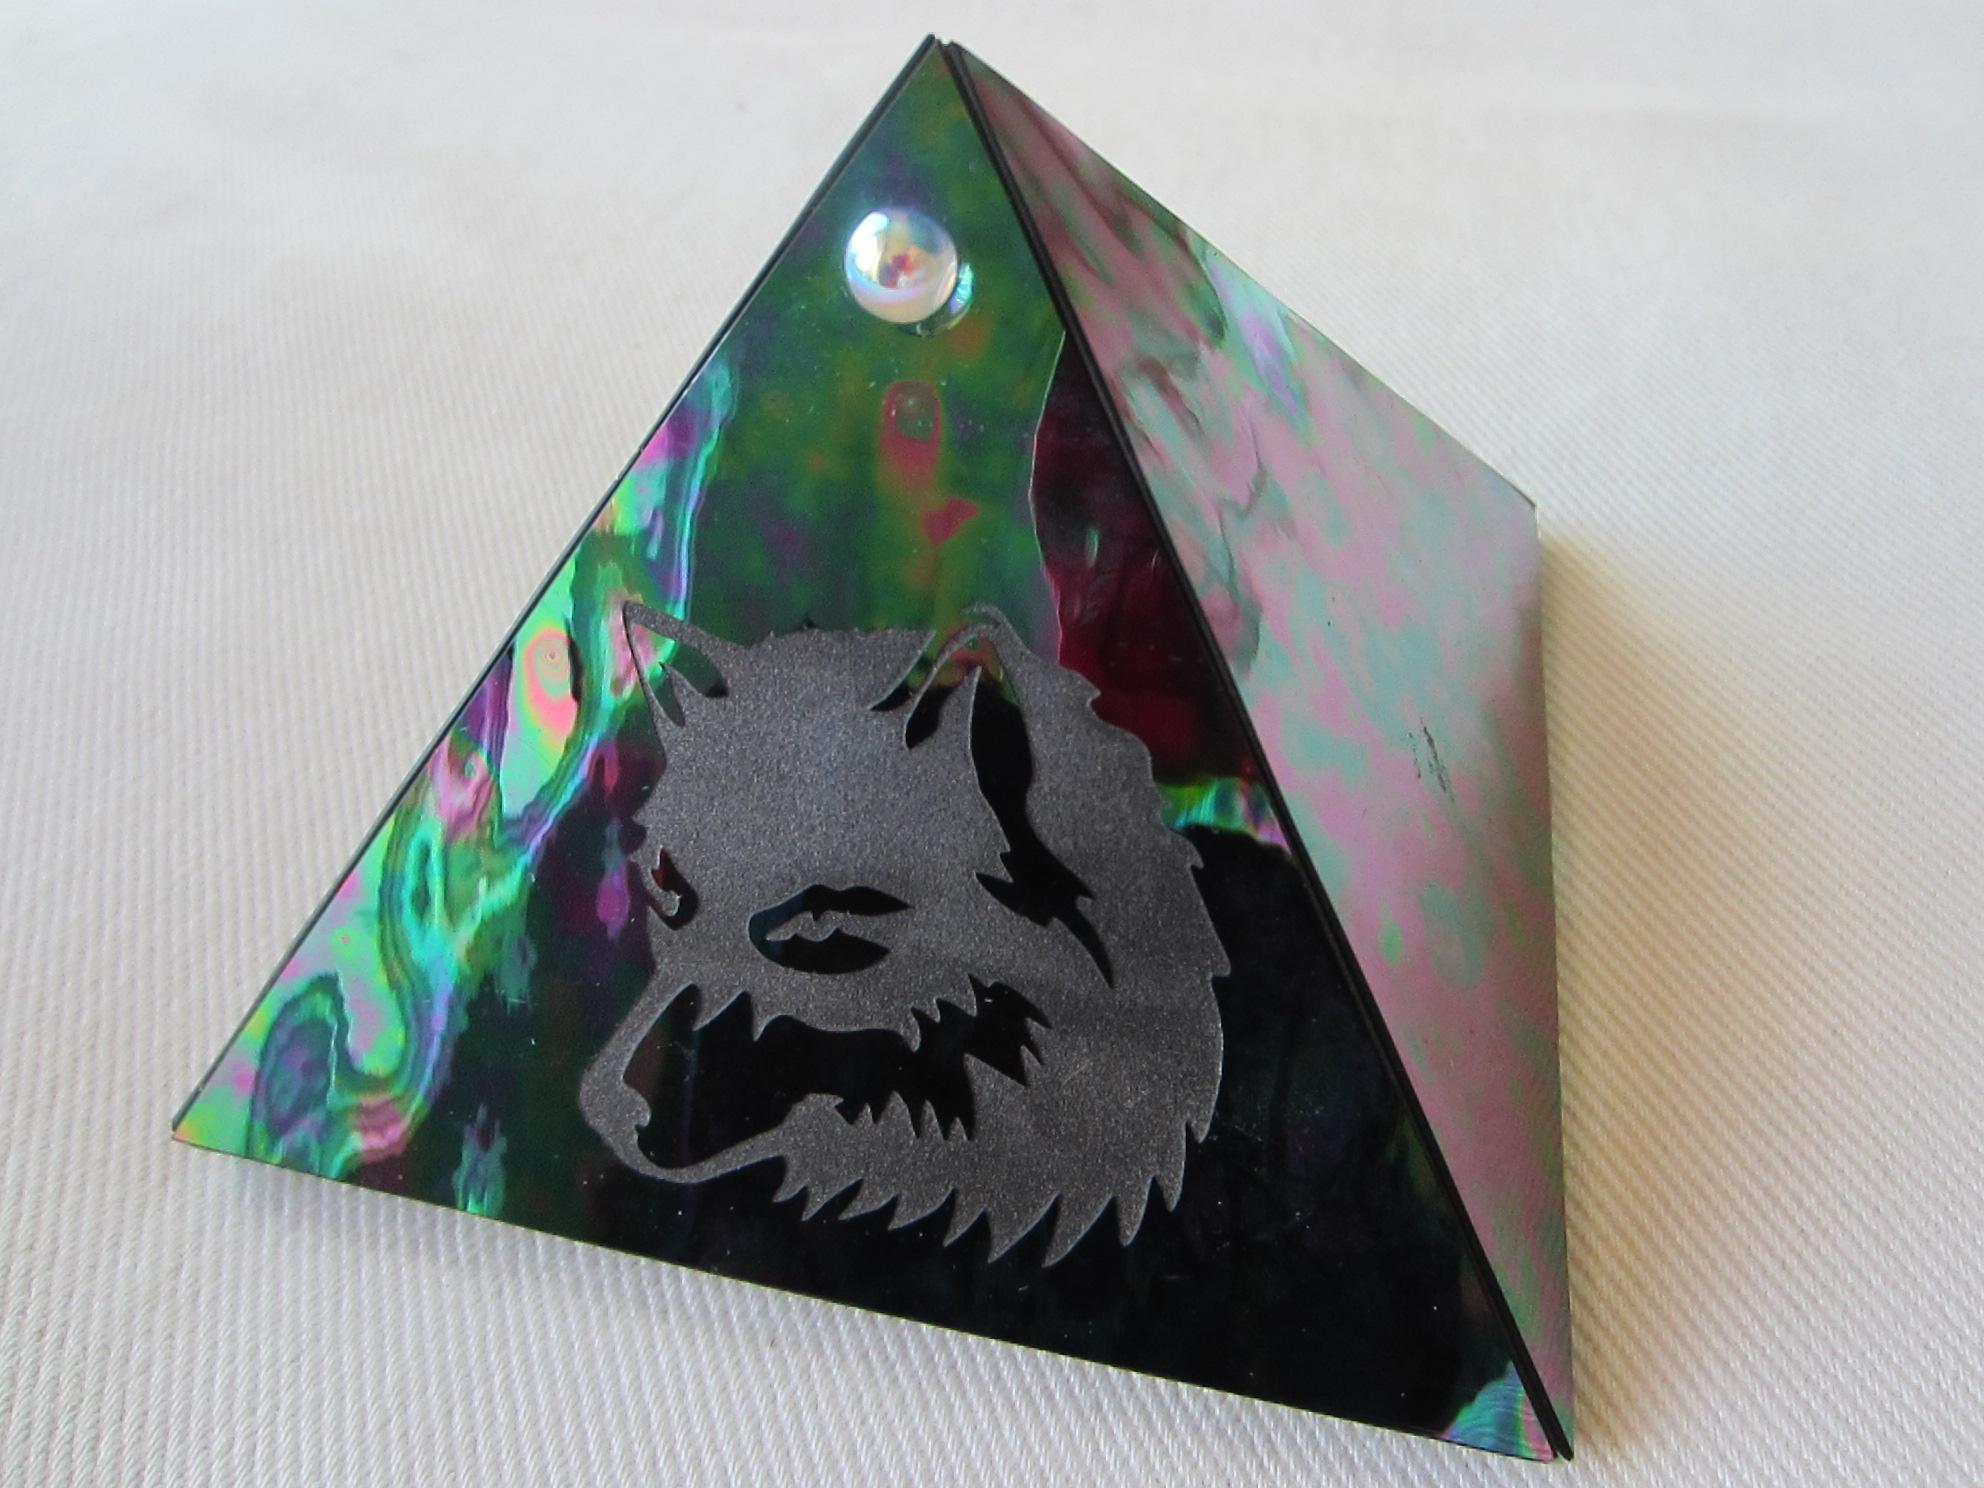 Kheops International Glass Pyramid Trinket Box For Sale